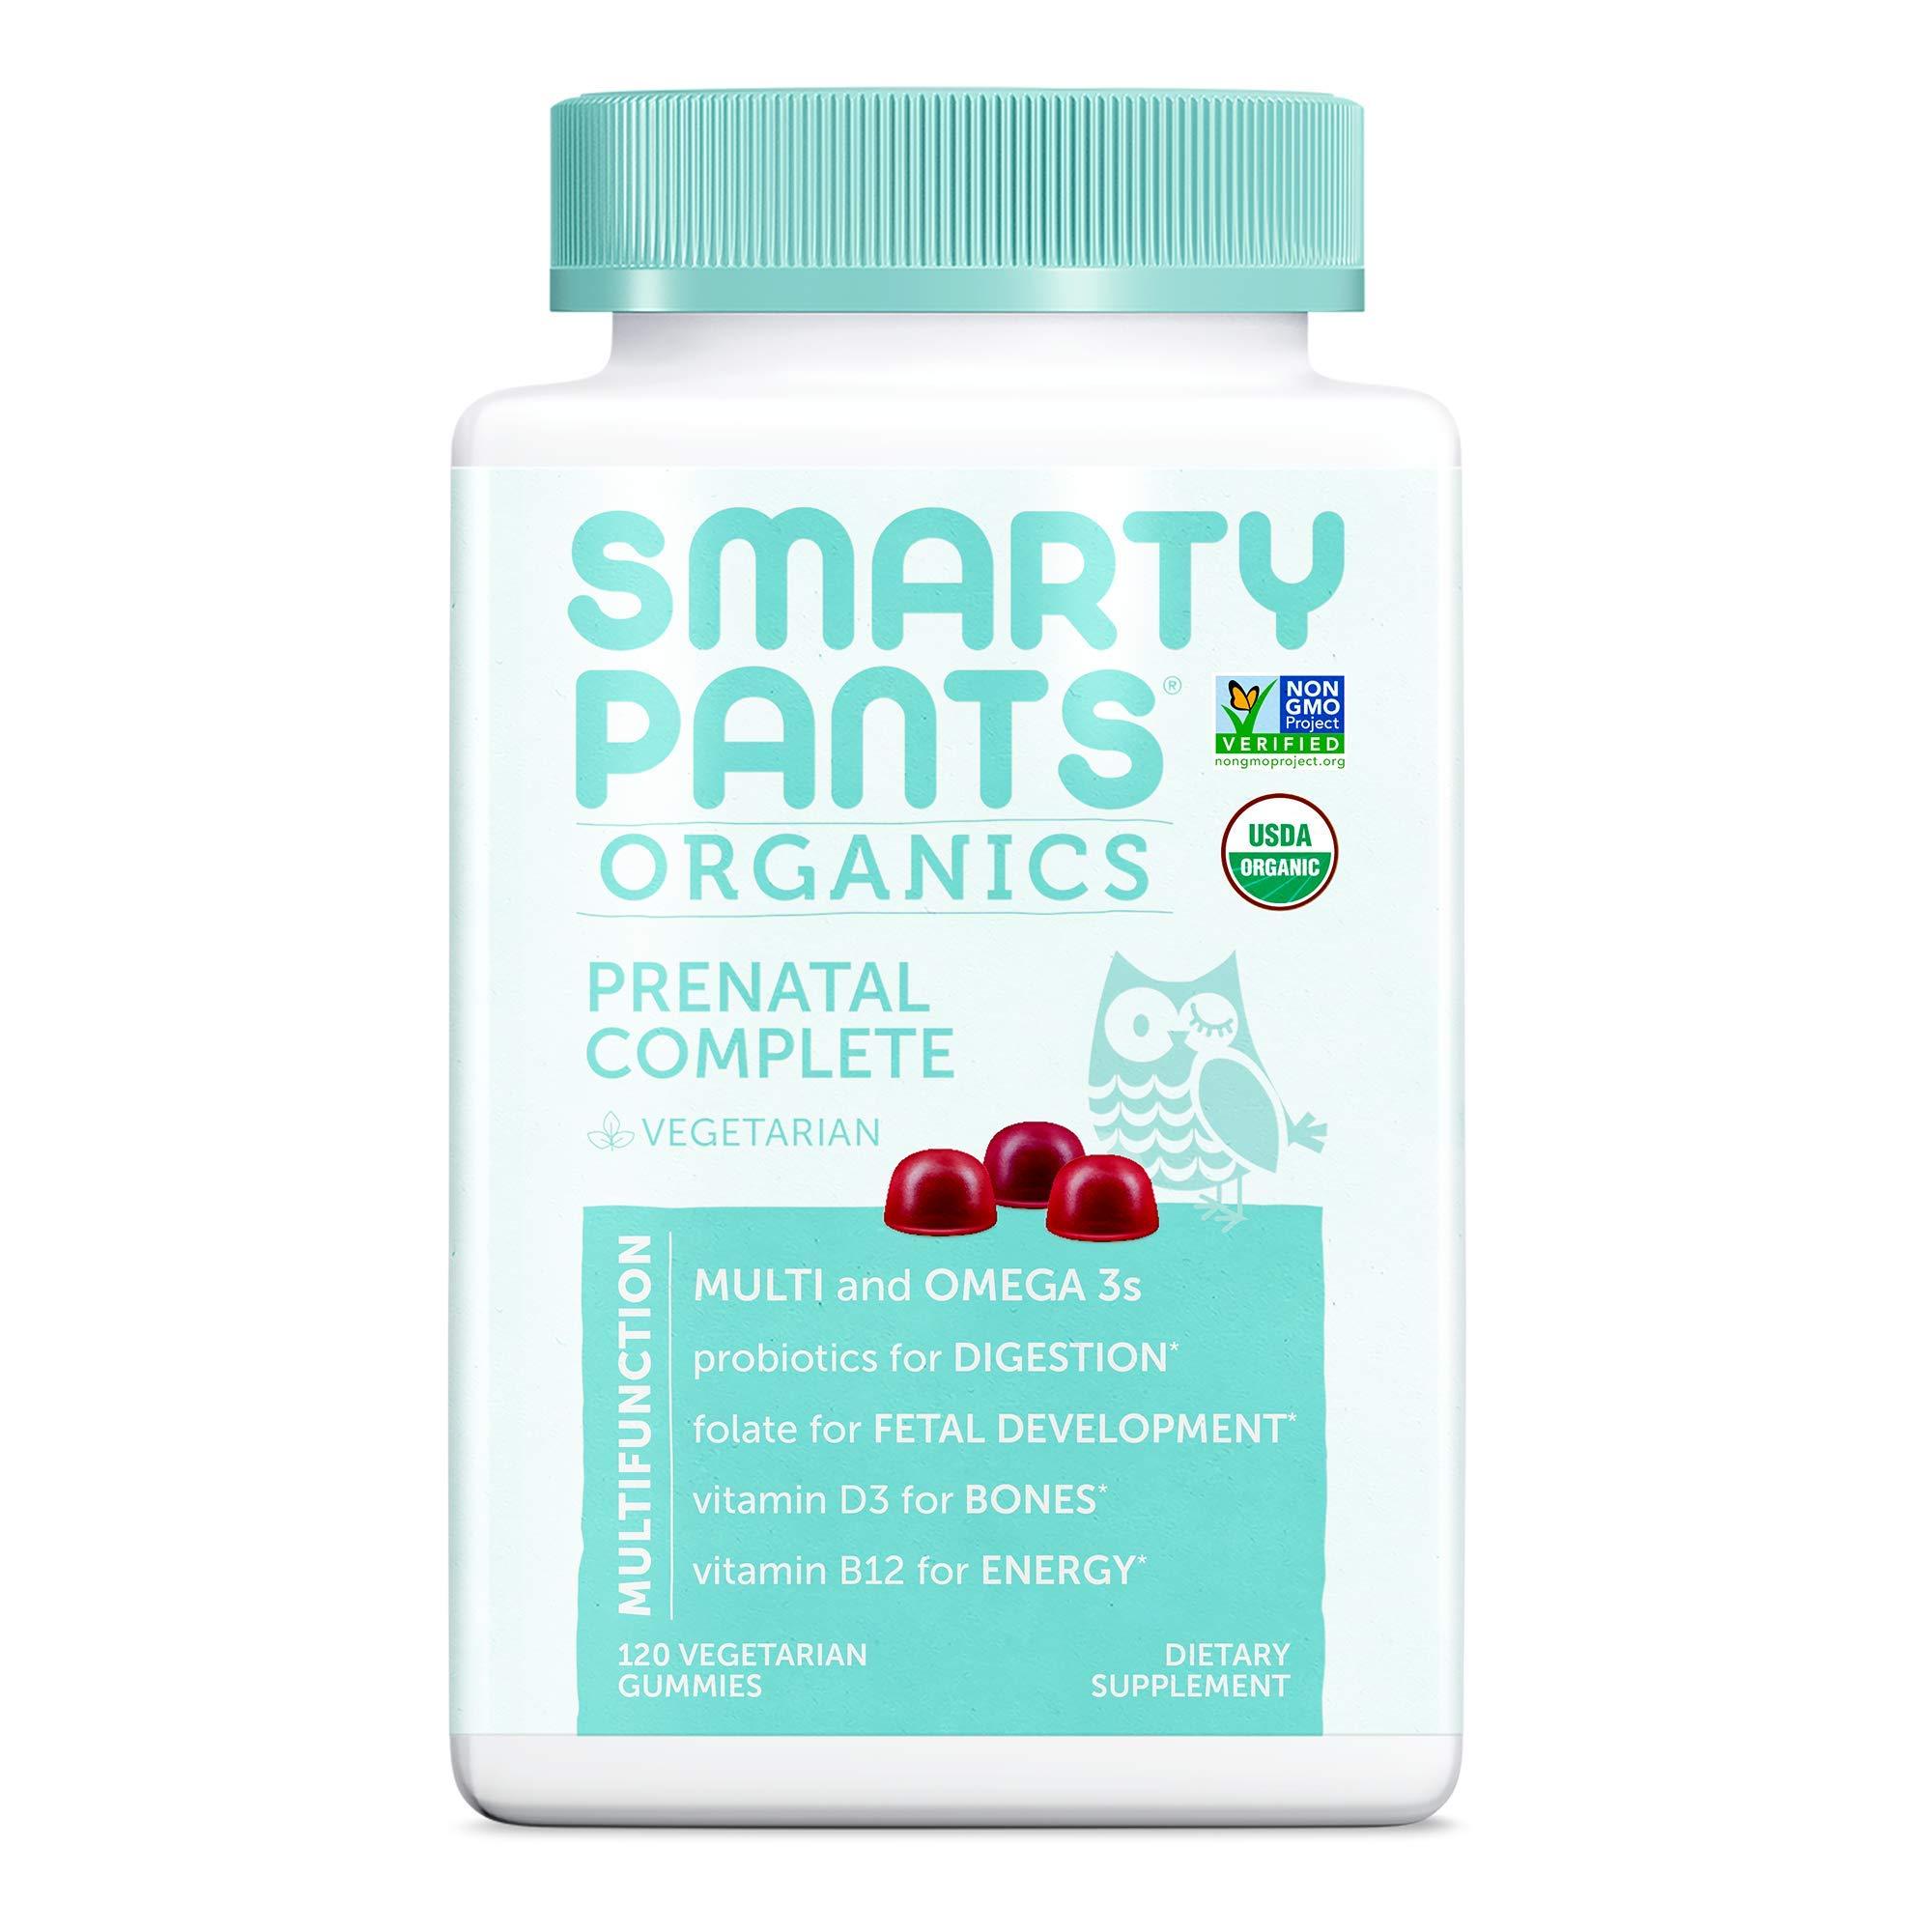 Smartypants Prenatal Complete